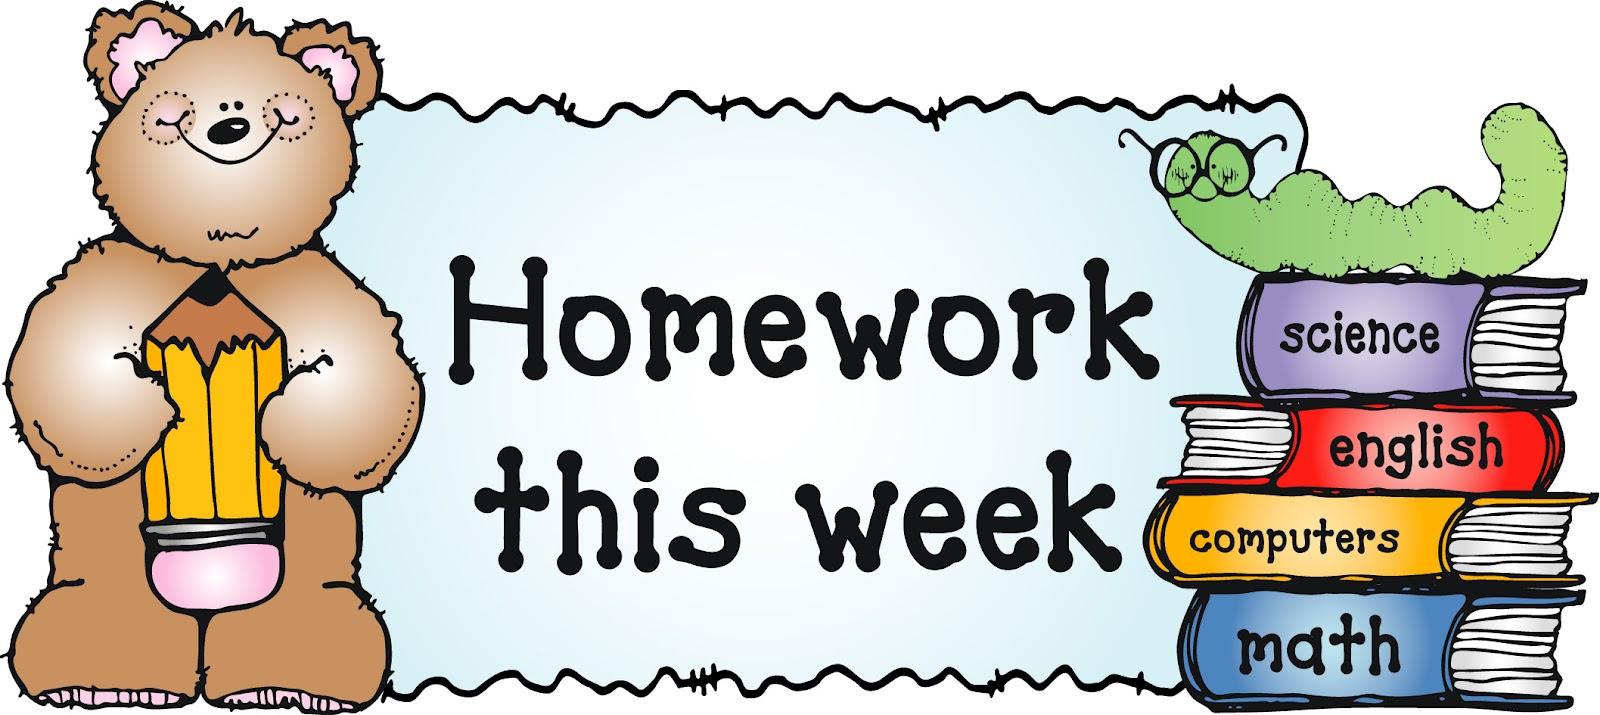 1600x715 Doing Homework Homework Clip Art Images Illustrations Photos 4